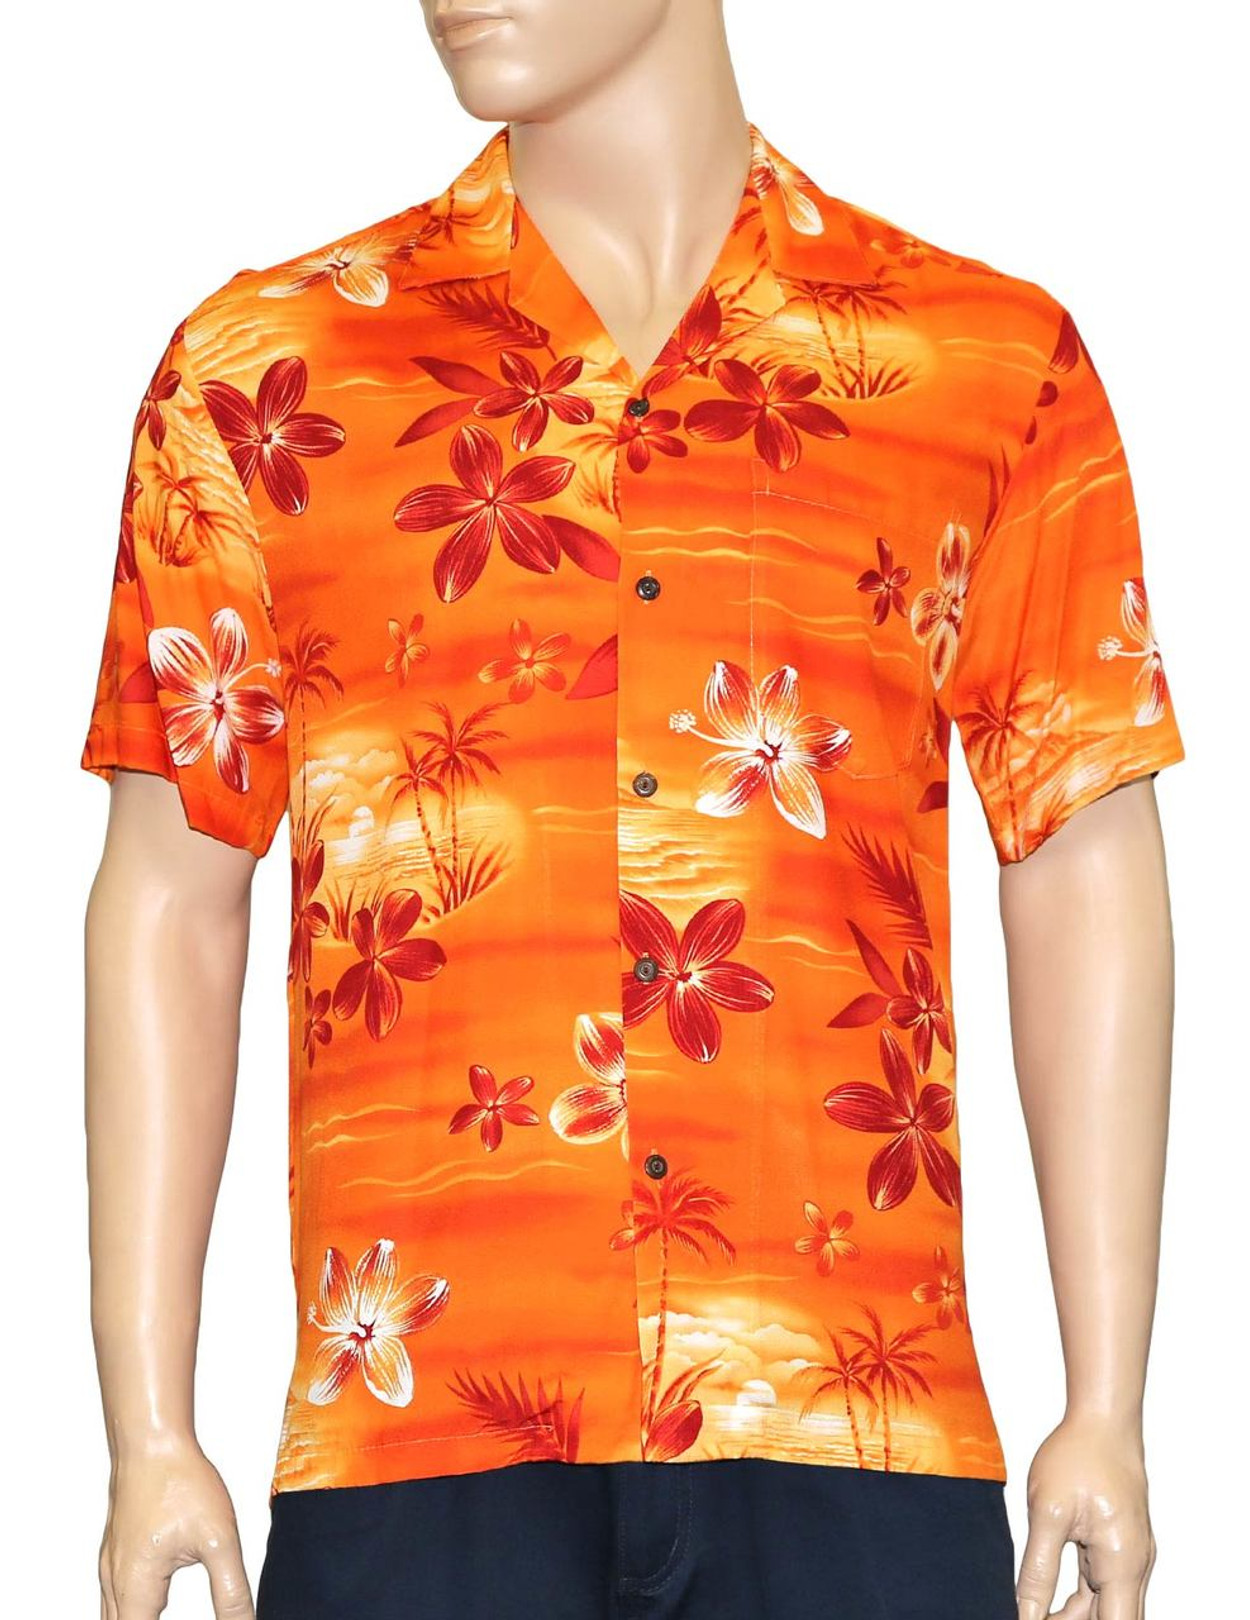 42fef1bf4c Hawaiian Shirt in Rayon Resort Moonlight Scenic